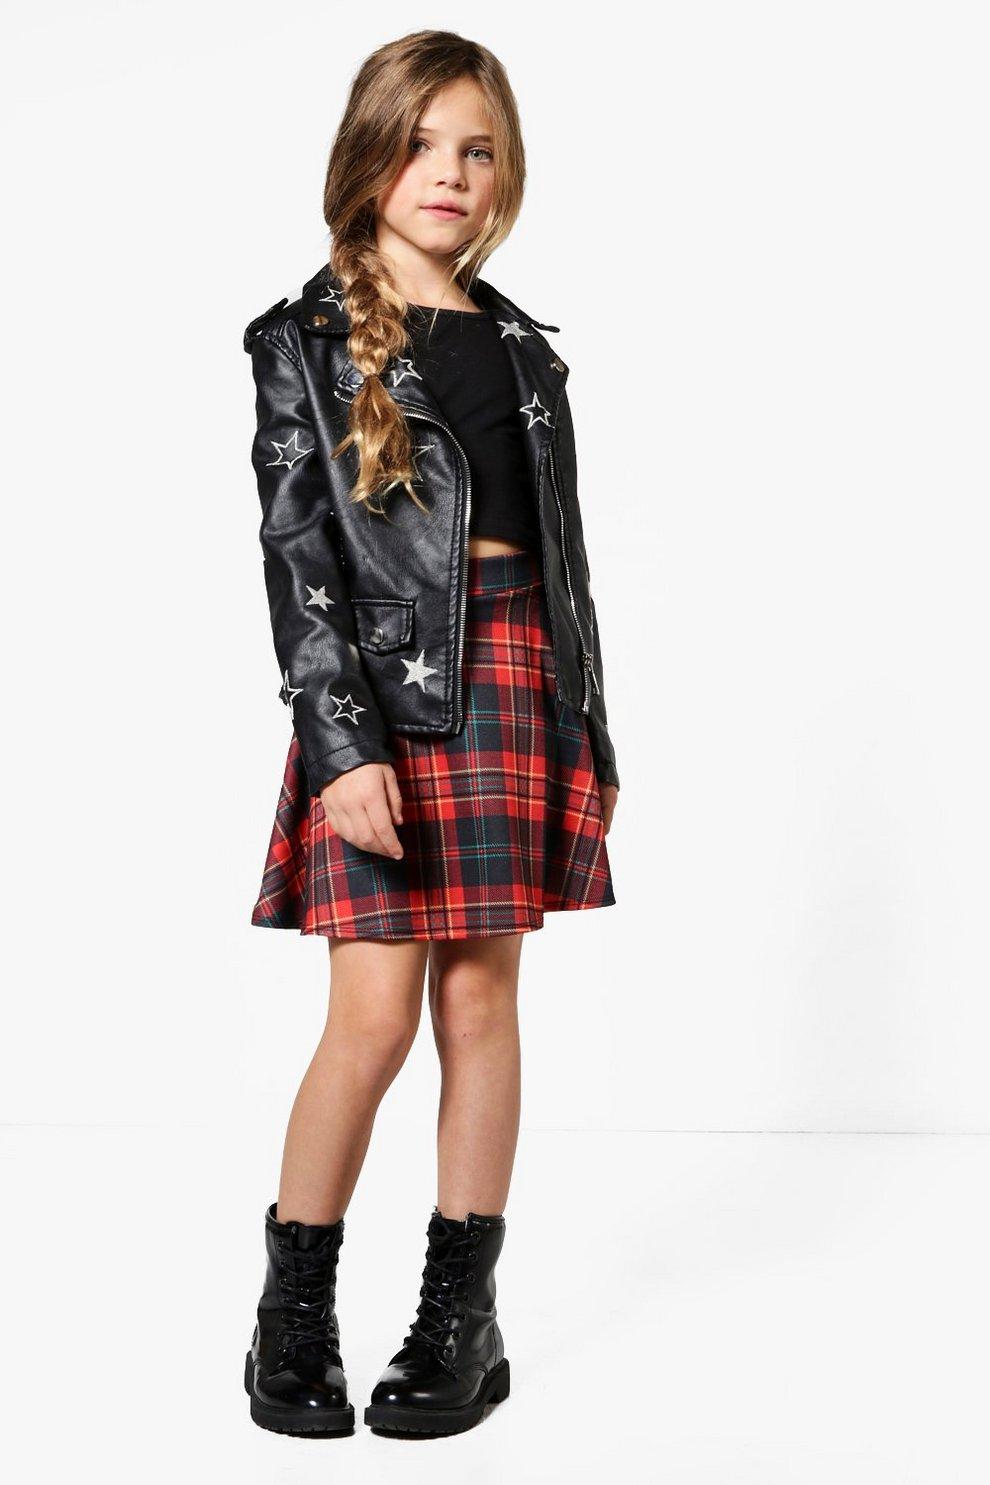 507c17db9 Girls Tartan Skater Skirt | Boohoo